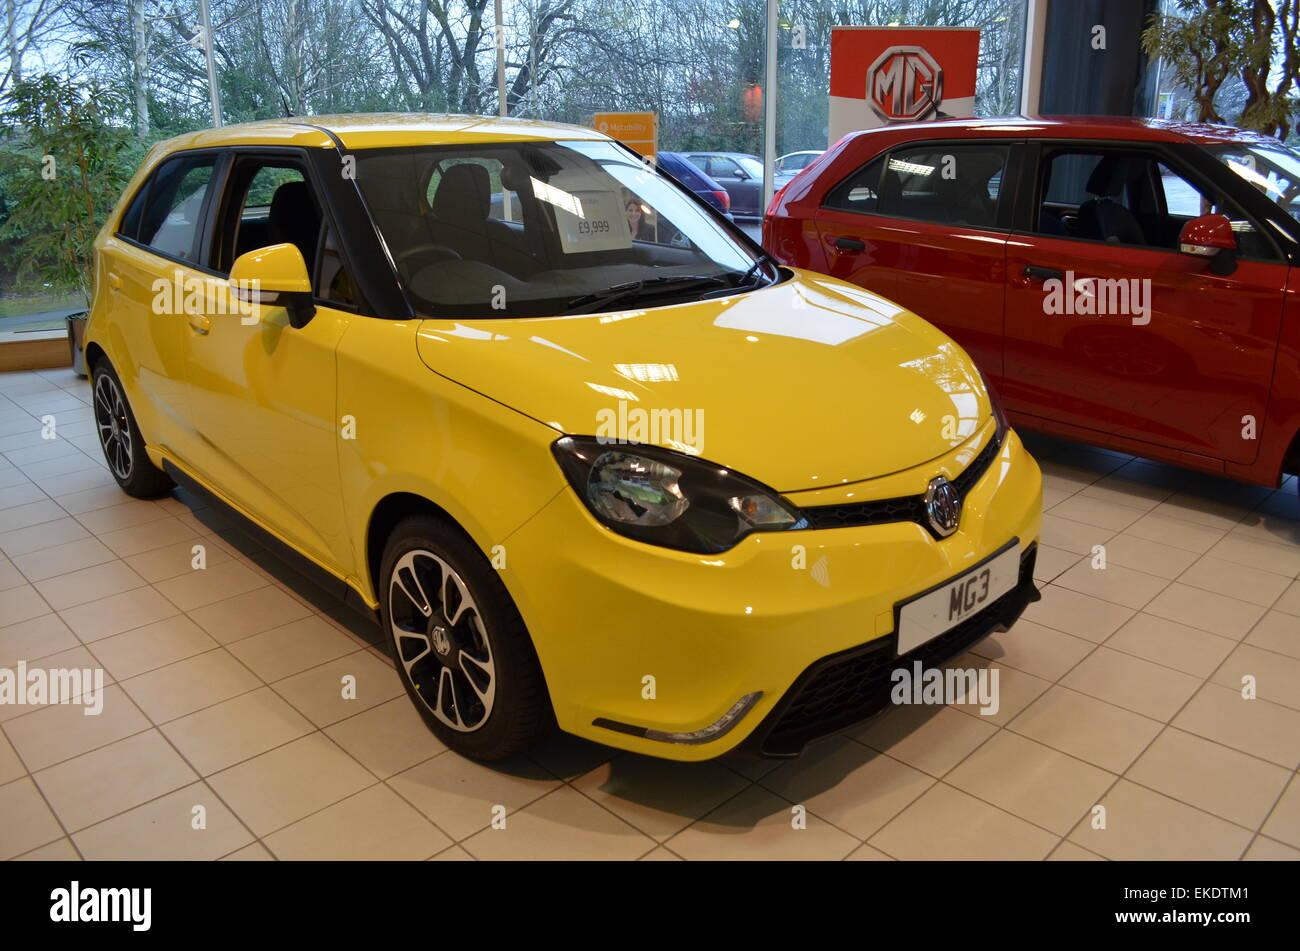 MG3 at car sales centre, MG, Longbridge, Birmingham. - Stock Image